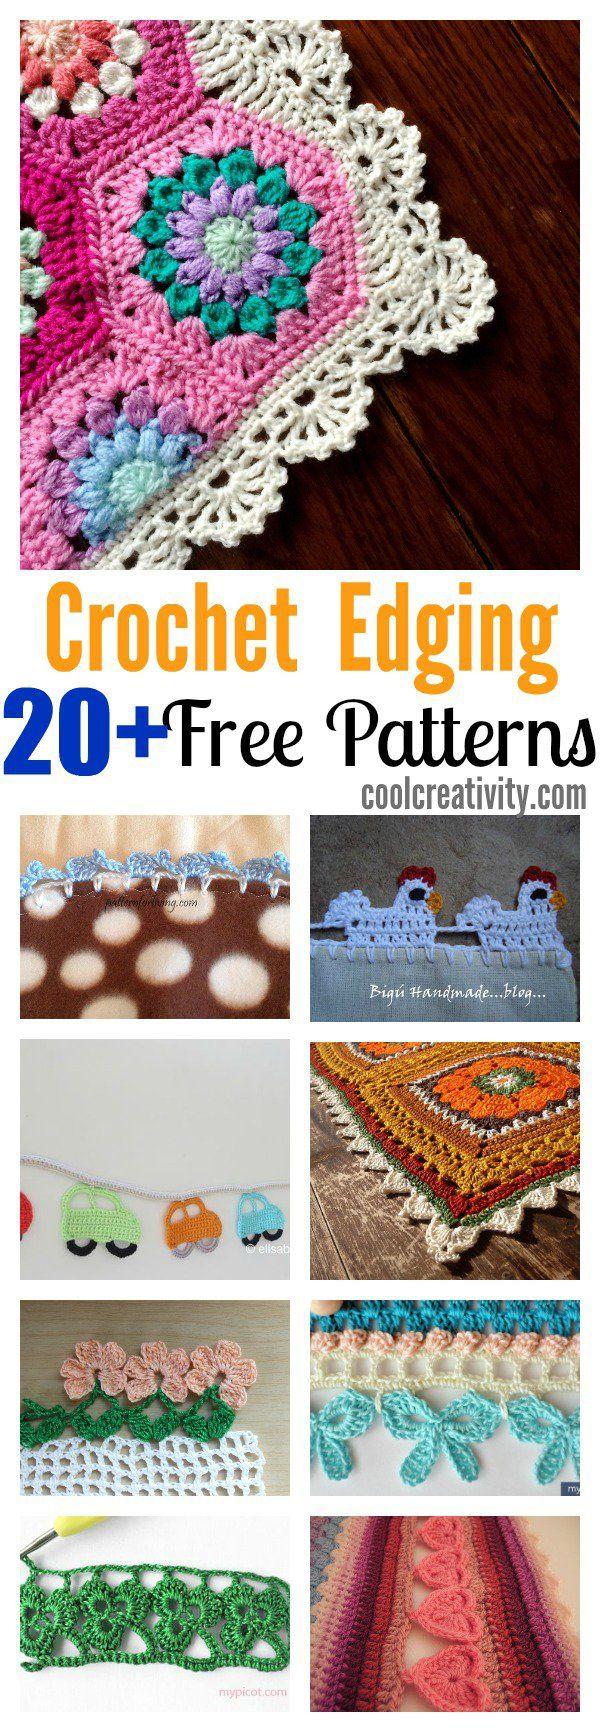 20 + Crochet Free Edging Patterns You Should Know | Patrón de ...